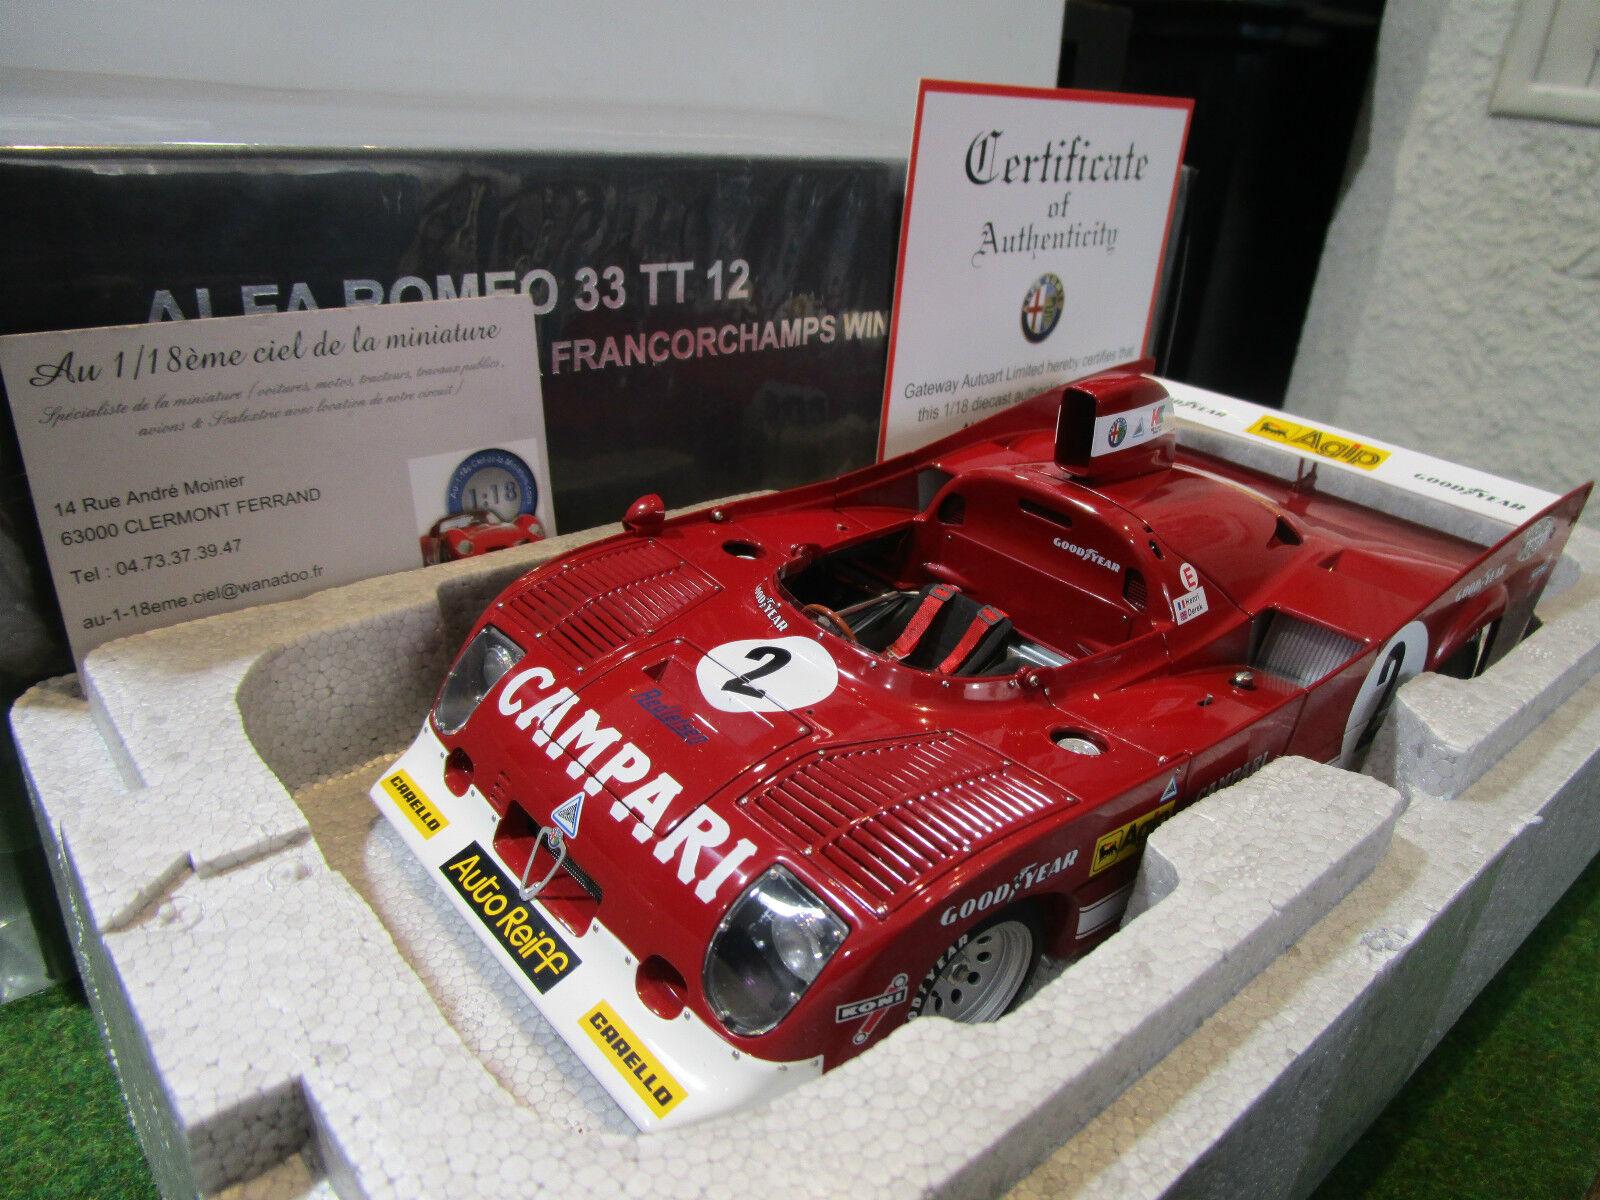 ALFA ROMEO 33 33 33 TT 12  2 WINNER SPA 1975 1 18 AUTOART 87503 voiture miniature coll 491e12